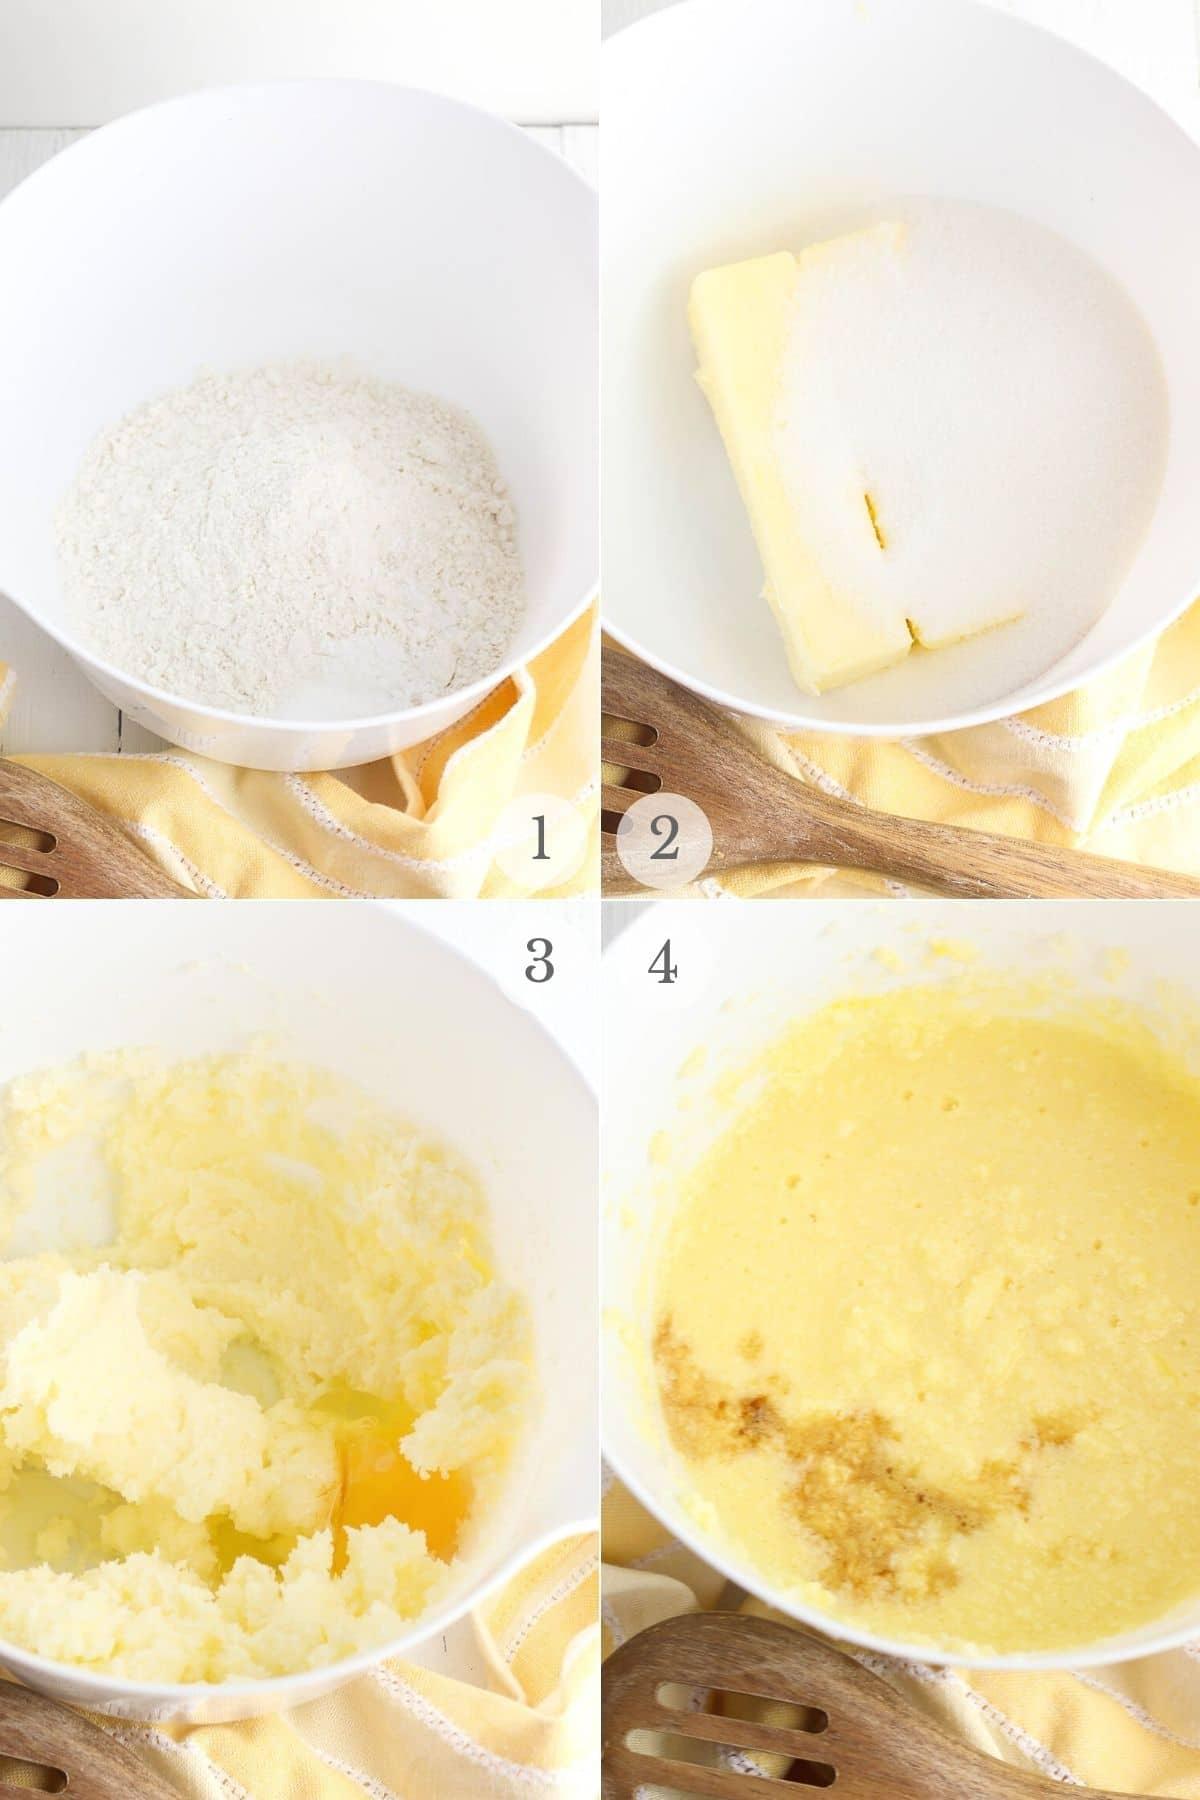 lemon blueberry muffins recipe steps 1-4